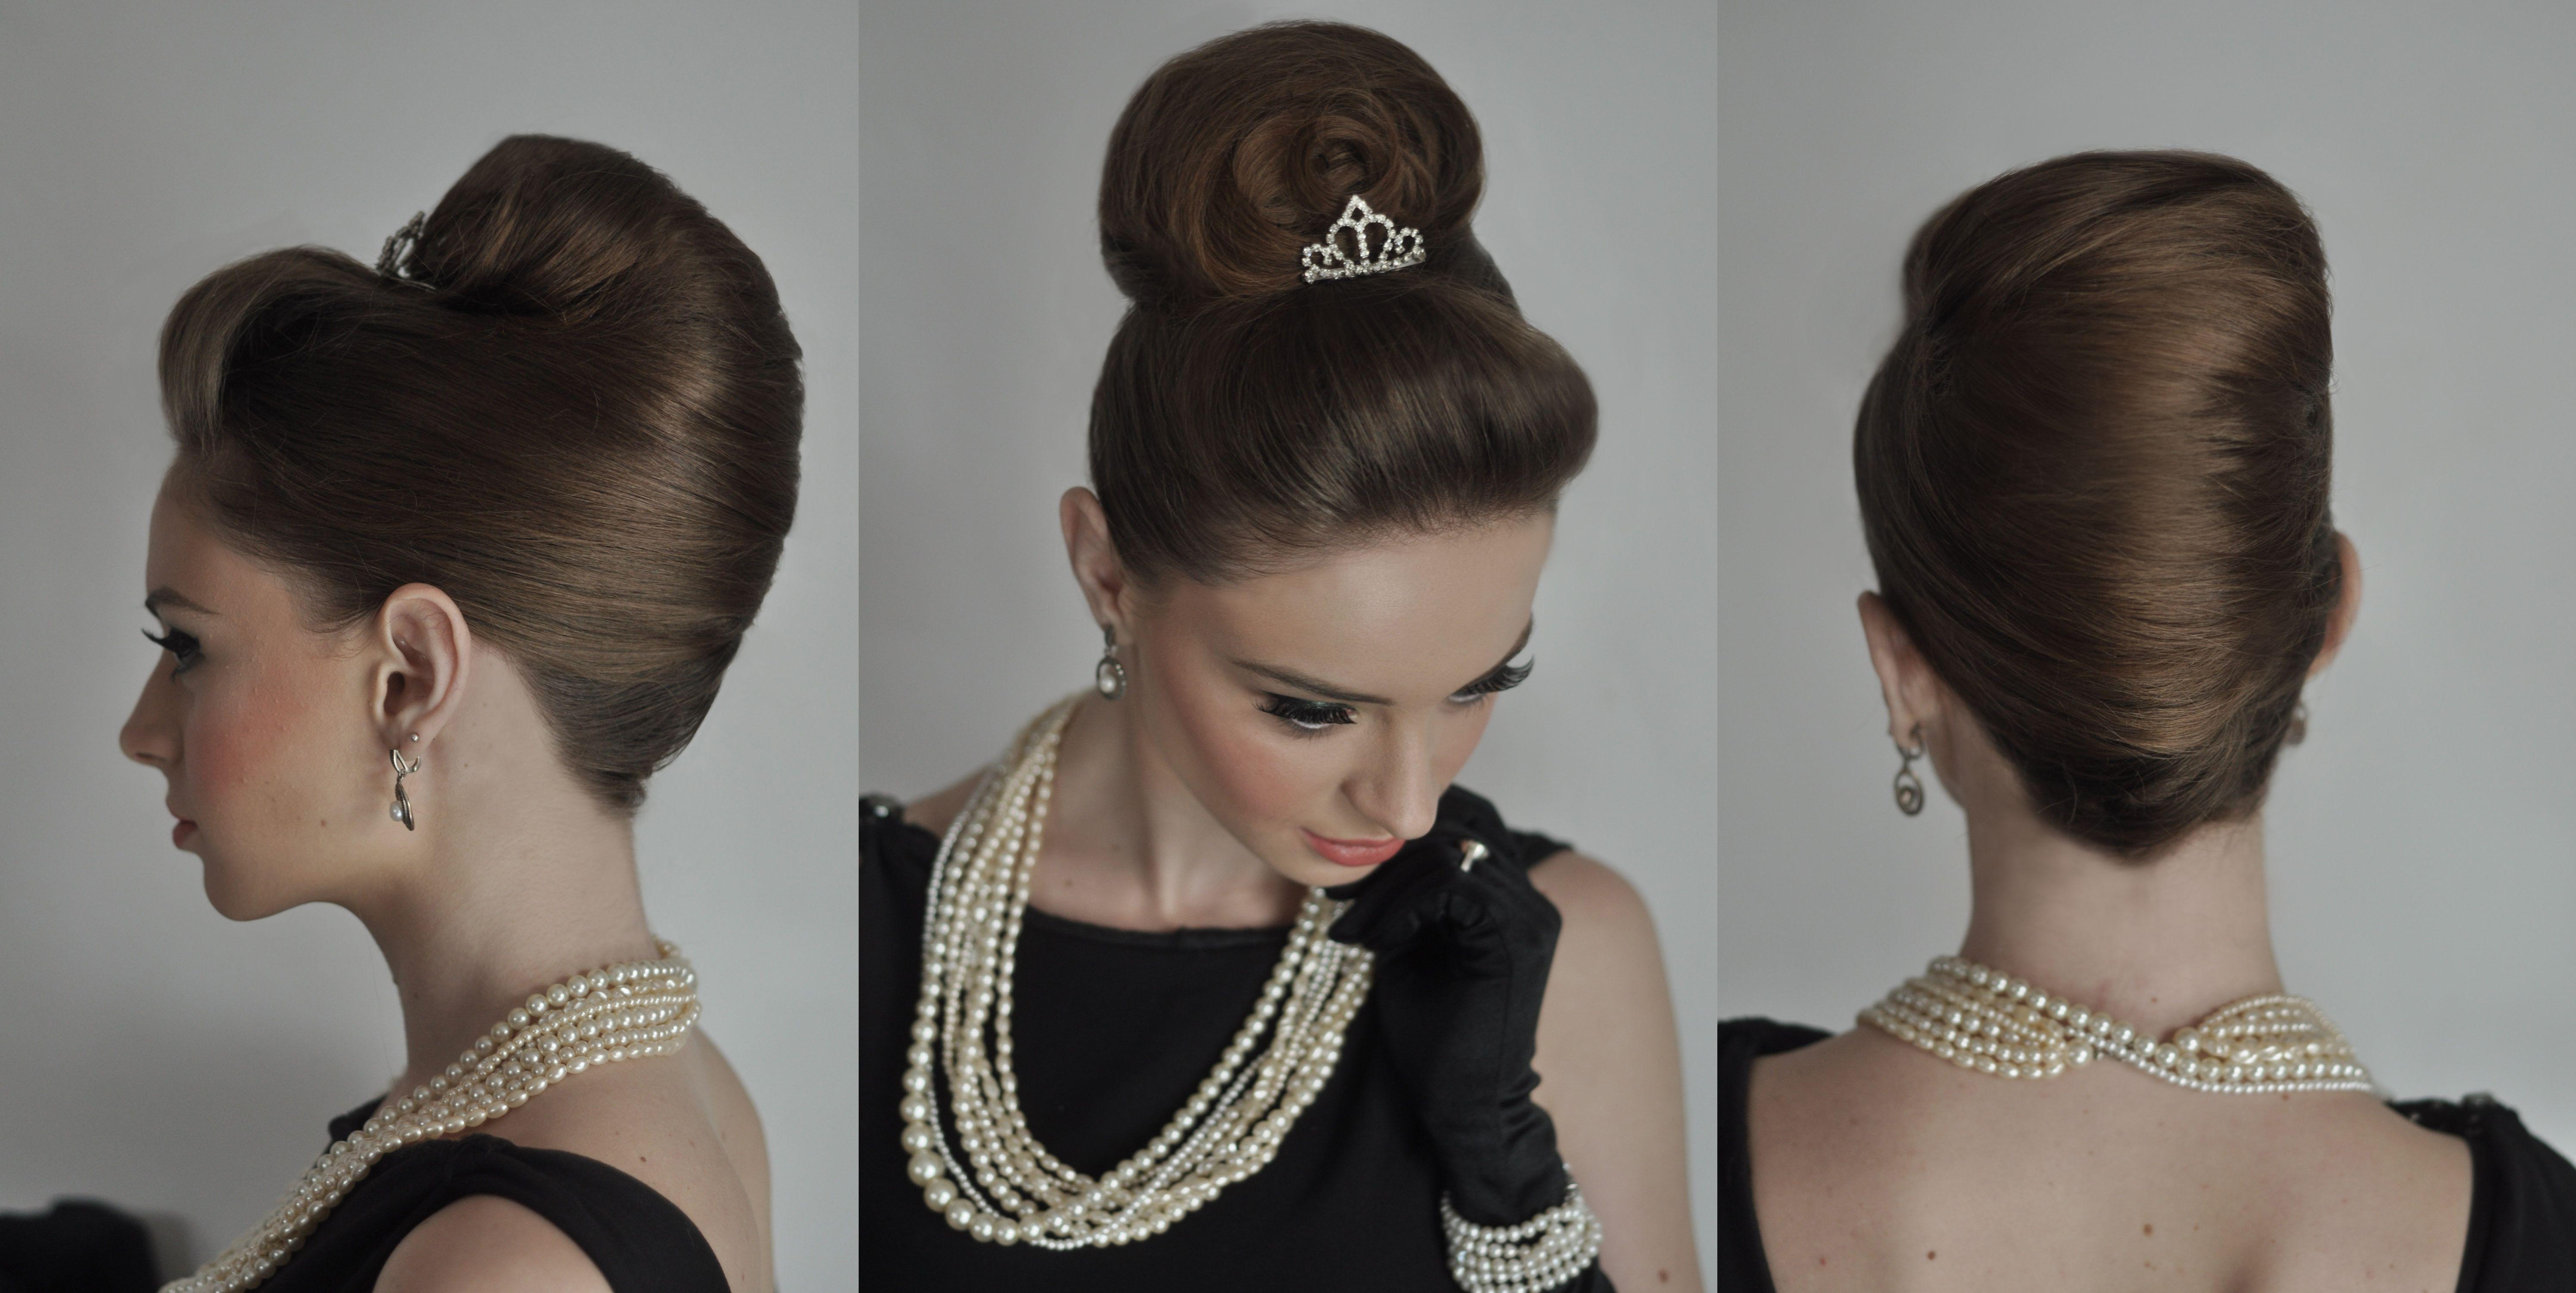 Astonishing Audrey Hepburn Hairstyles Hairstyles And Audrey Hepburn On Pinterest Short Hairstyles For Black Women Fulllsitofus